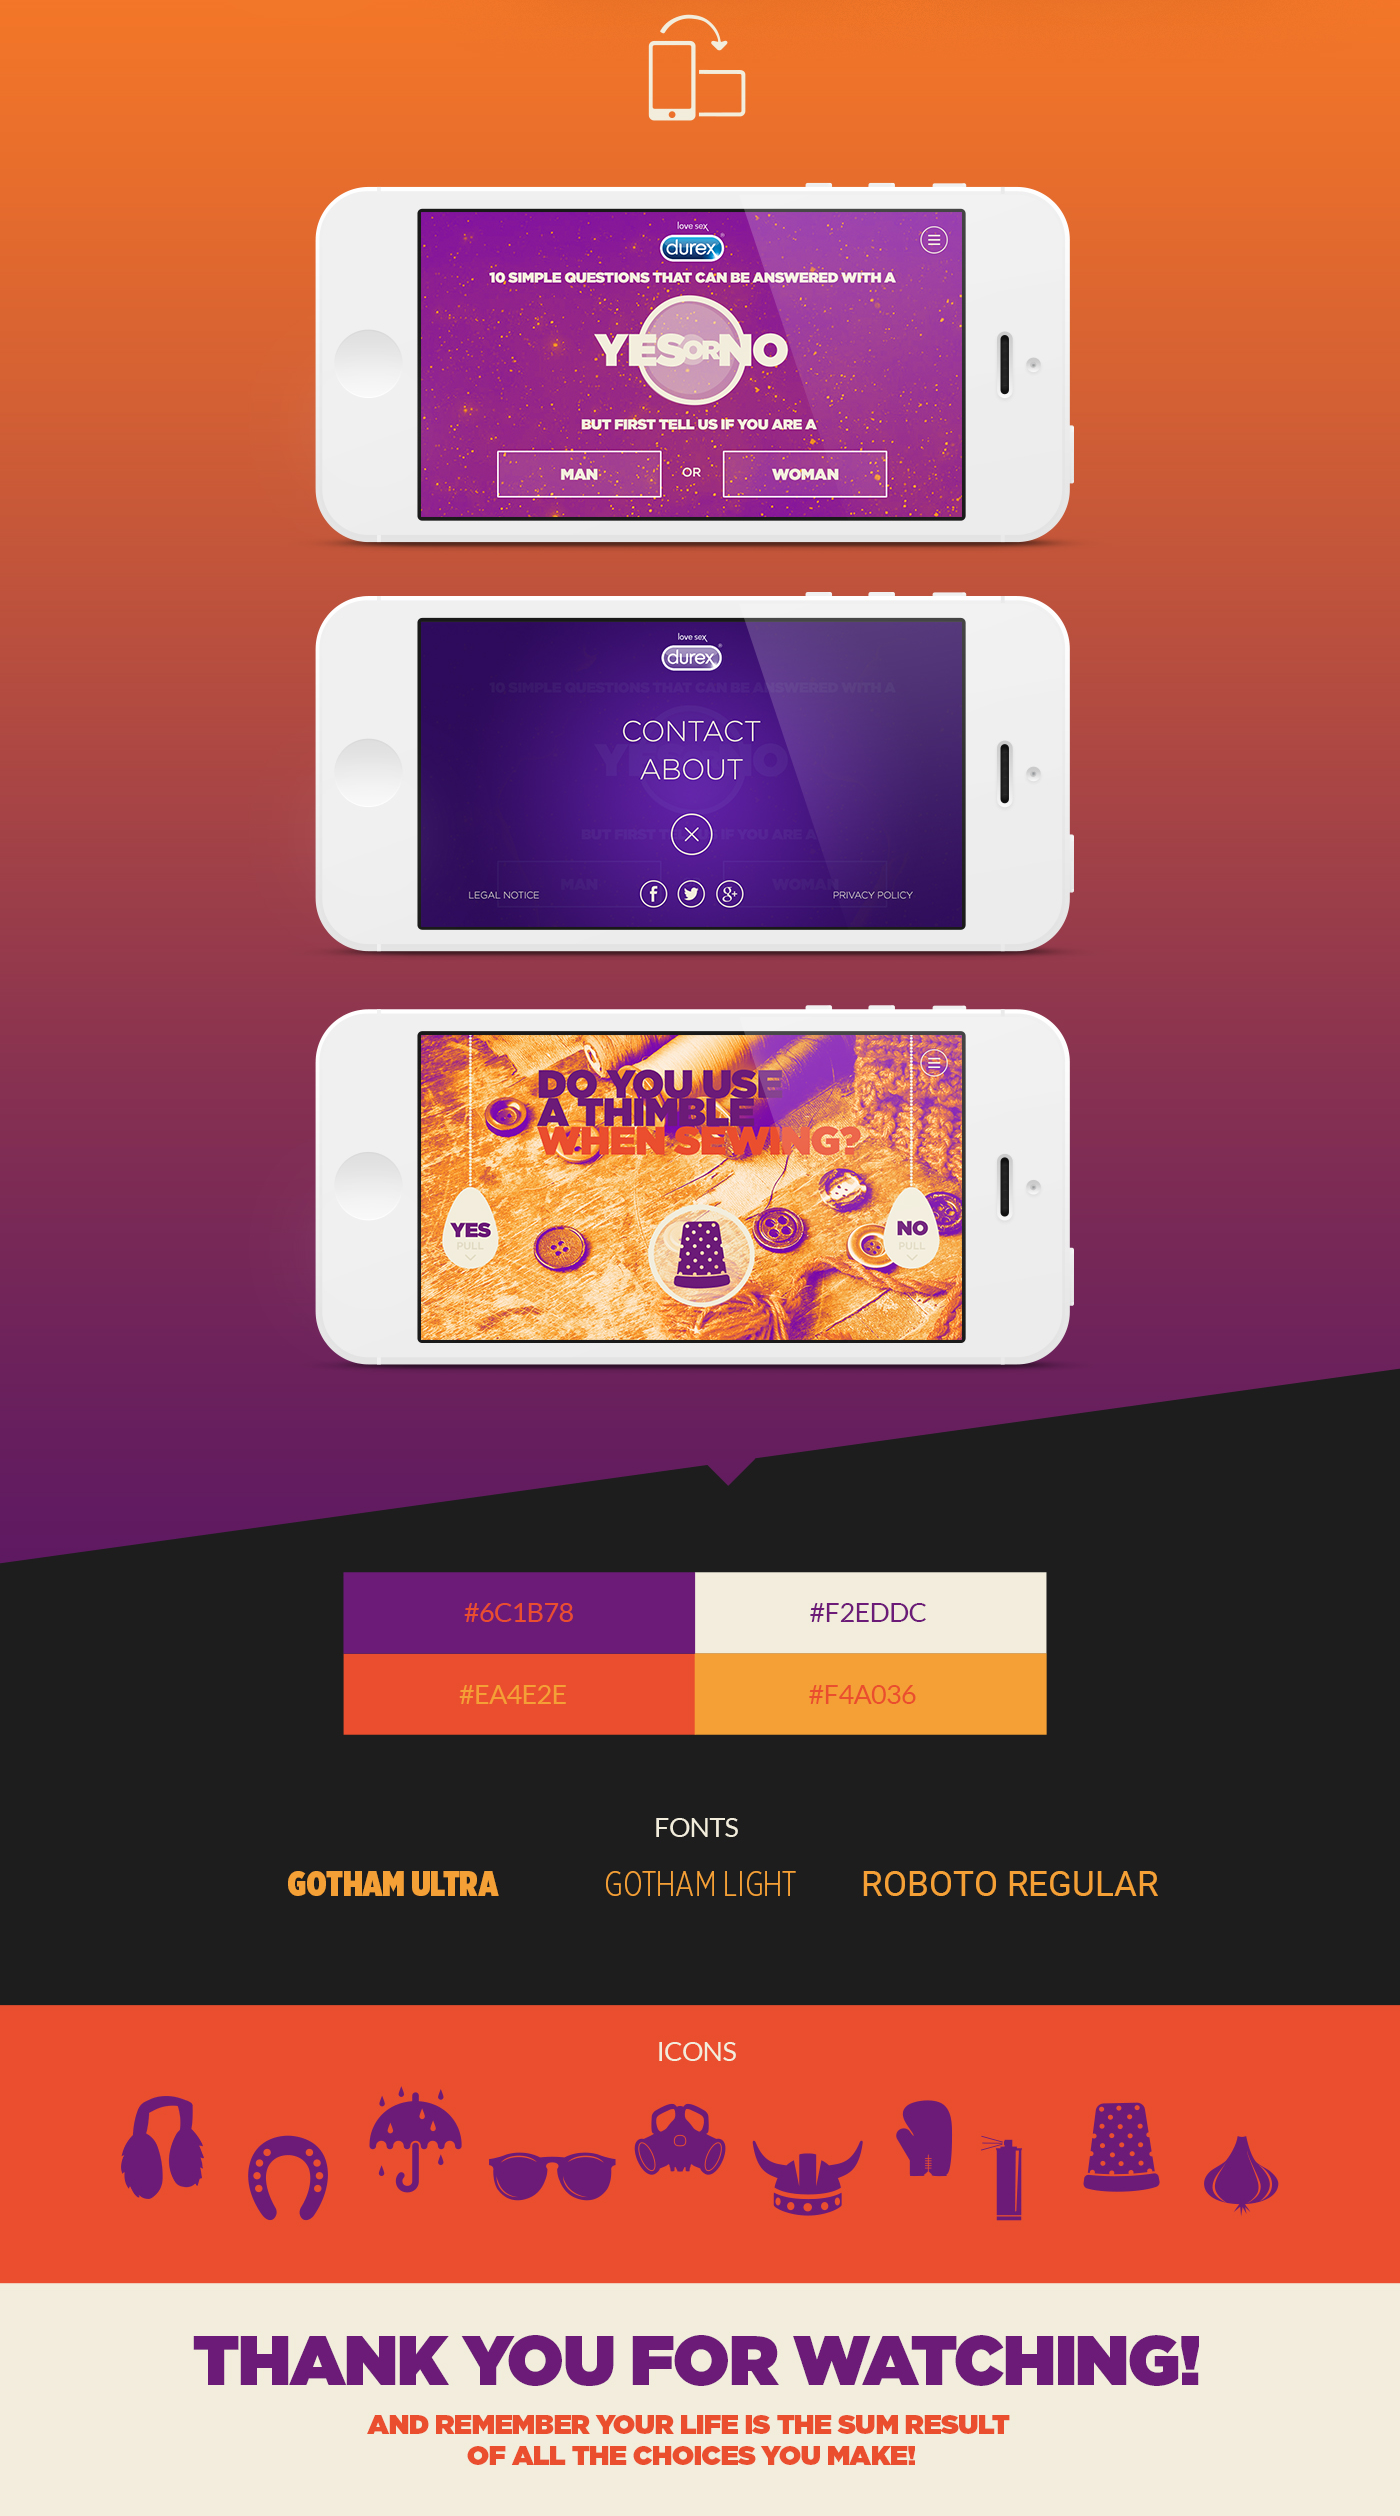 durex Responsive Website web site purple orange gradient site mobile iPad CONDOM infographic